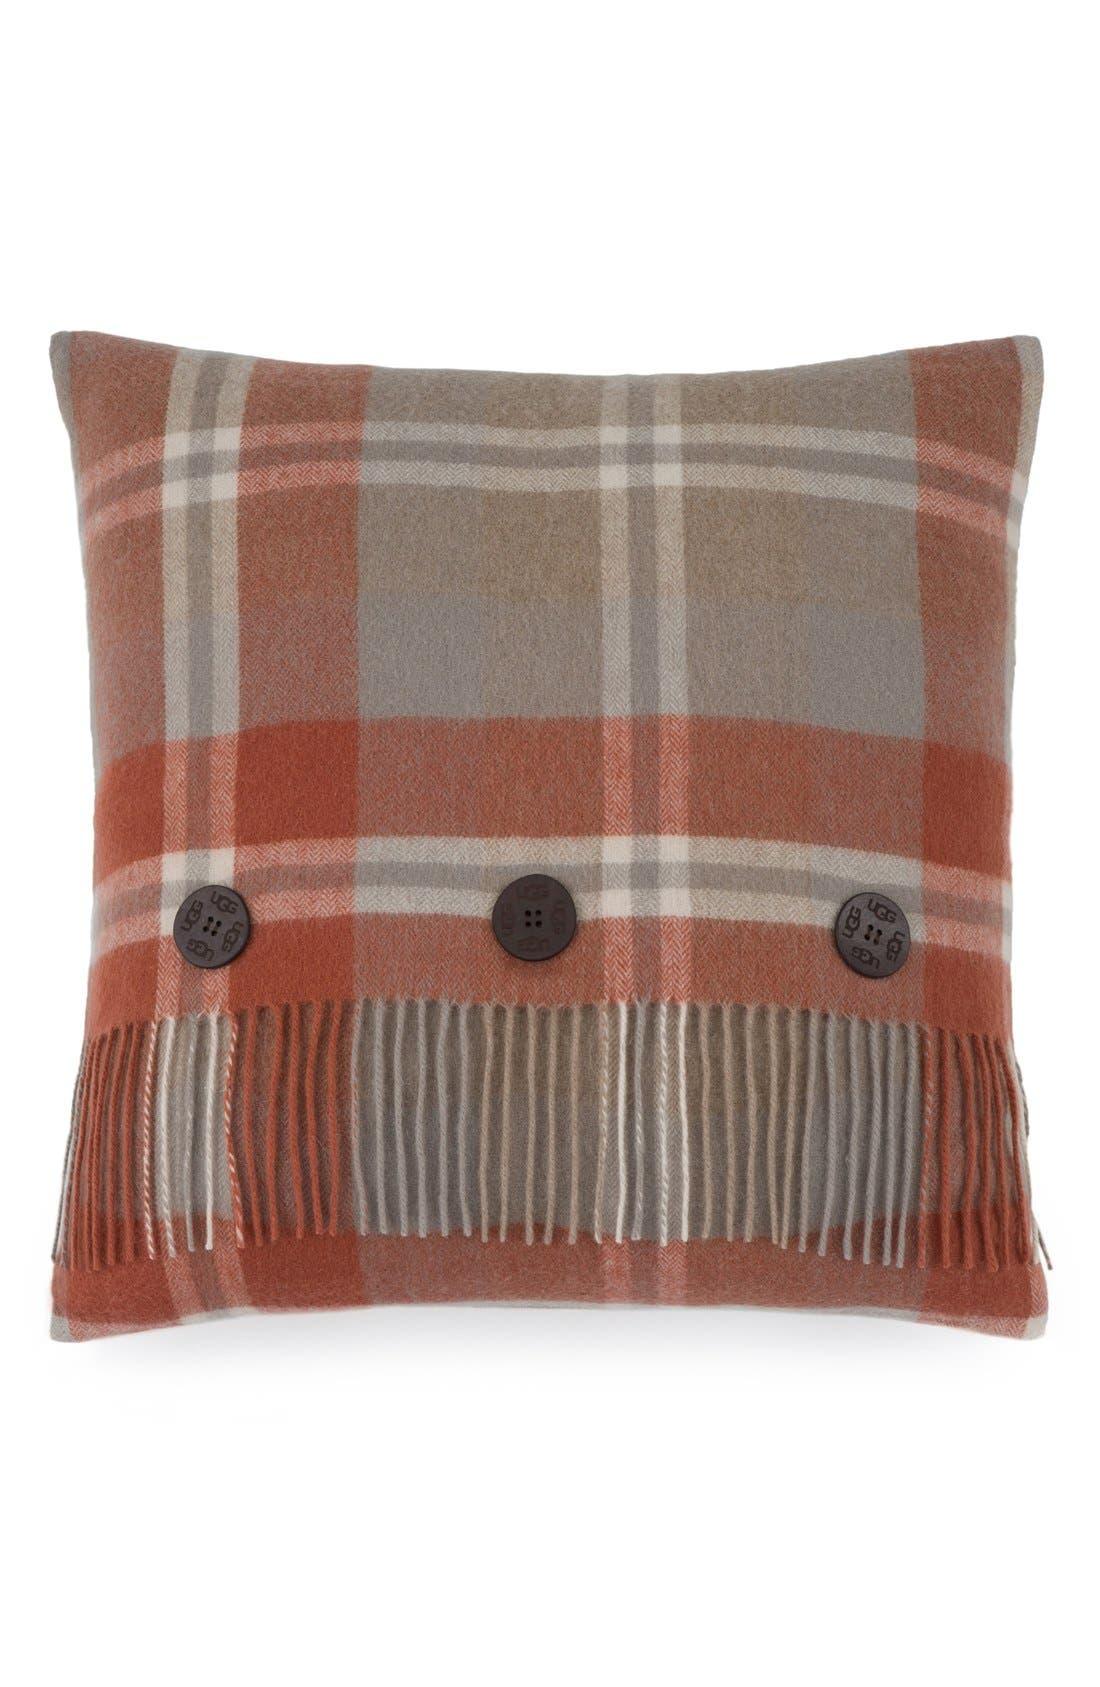 UGG<SUP>®</SUP> 'Glacier Plaid' Wool Pillow, Main, color, 600